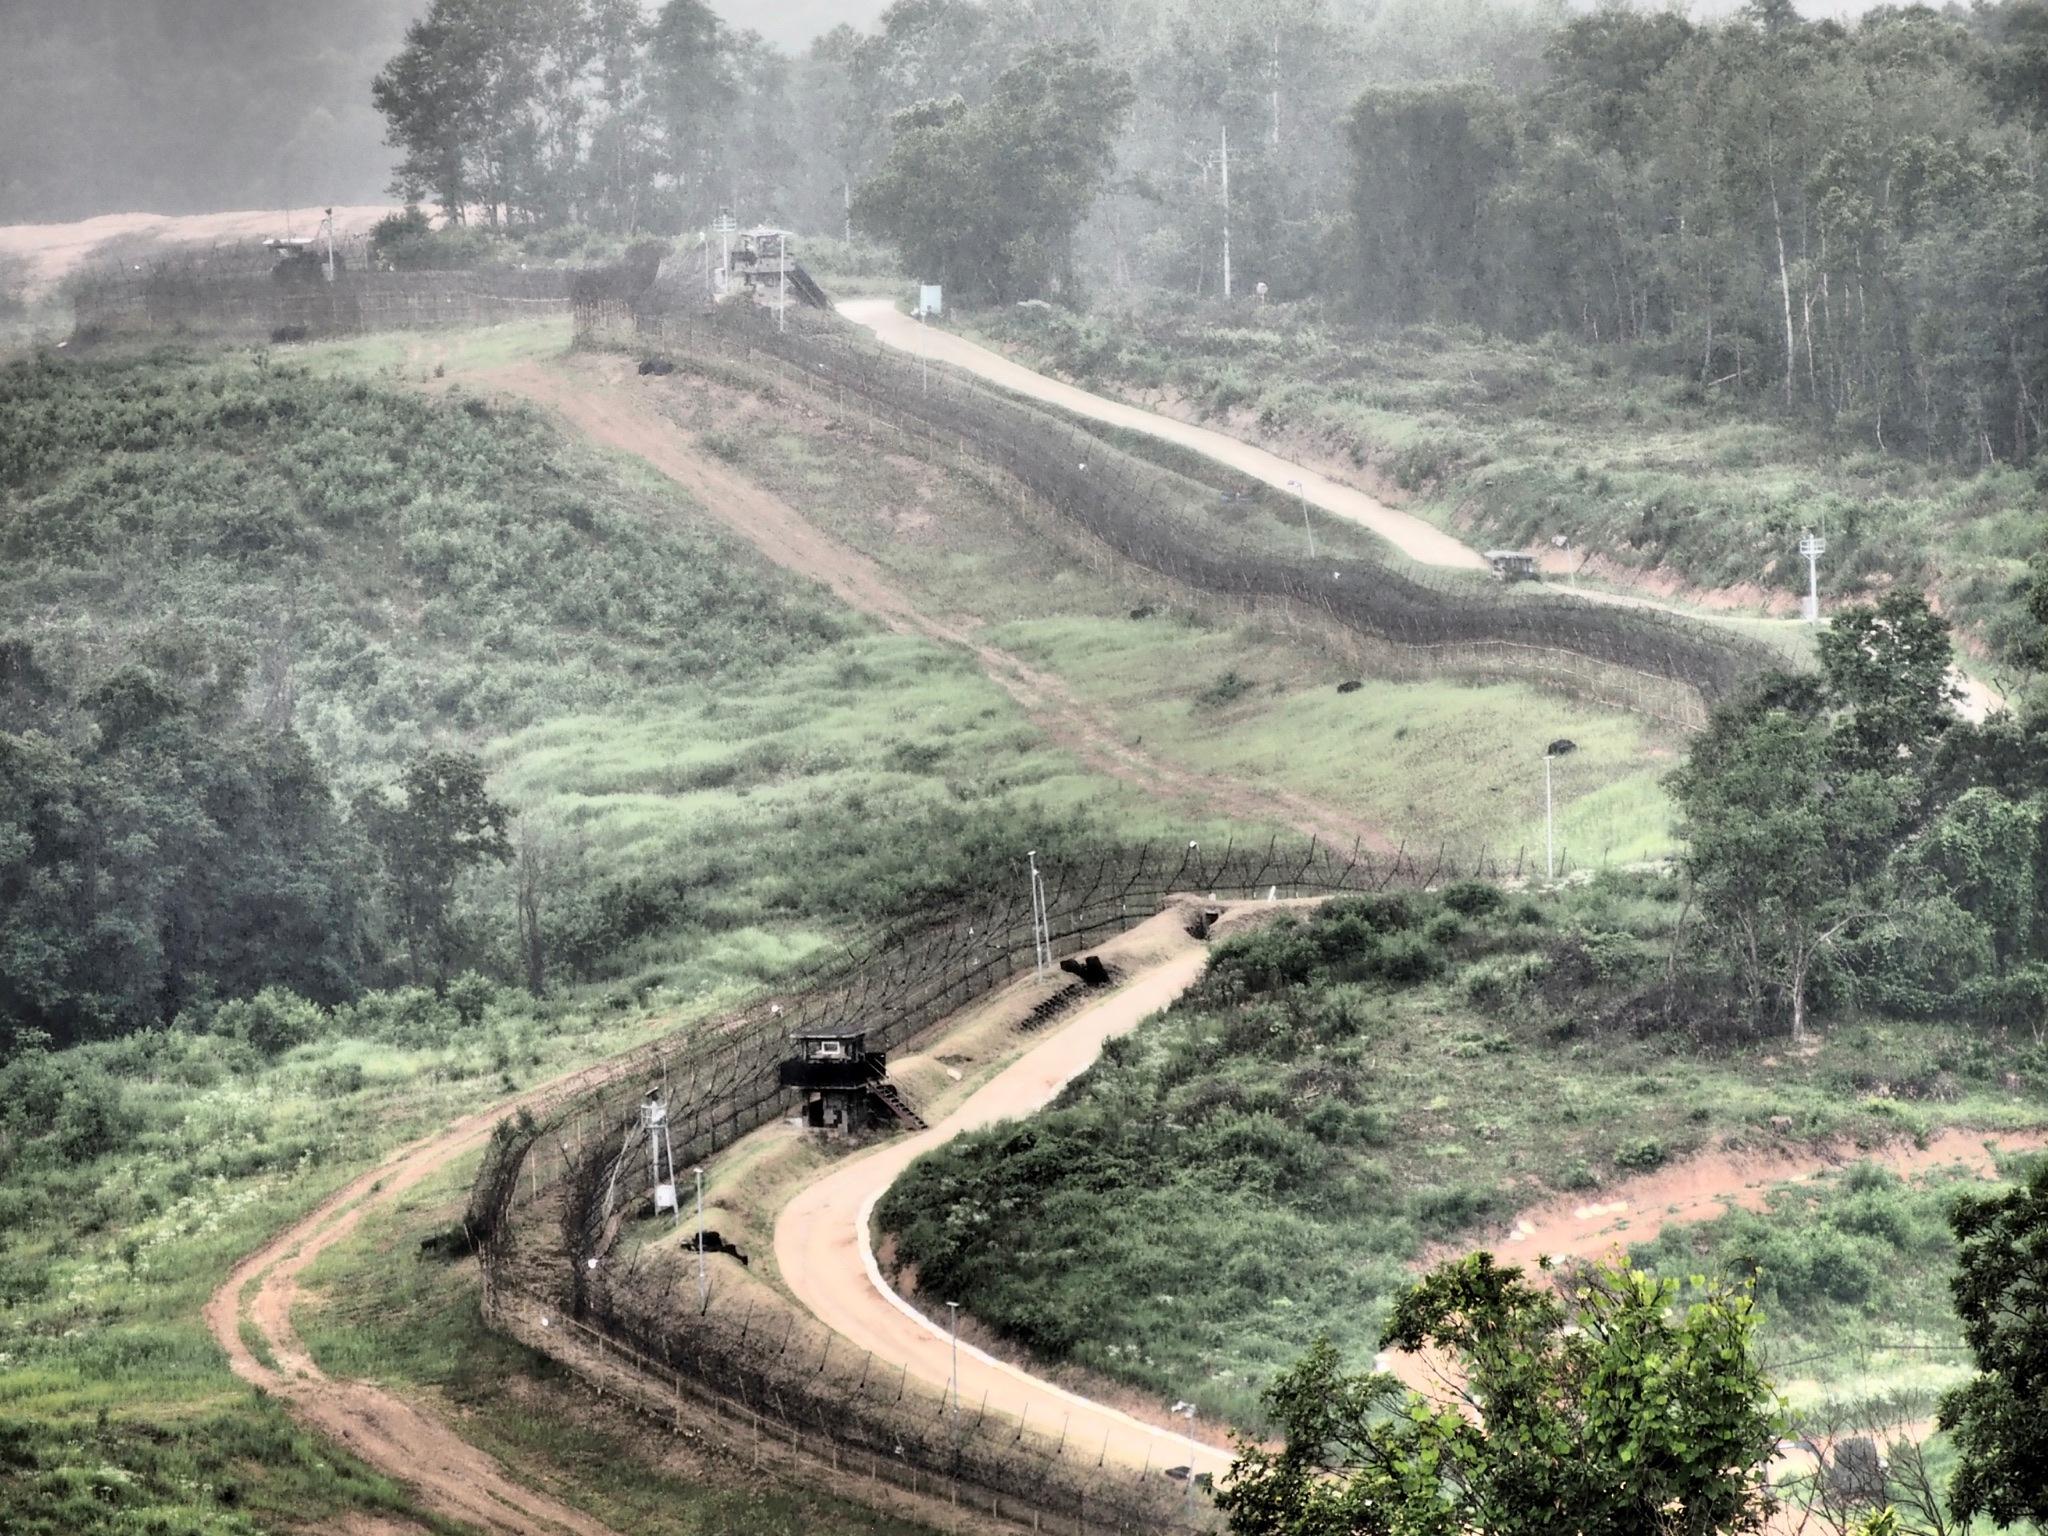 North and South Korean border by Dietrik Vr